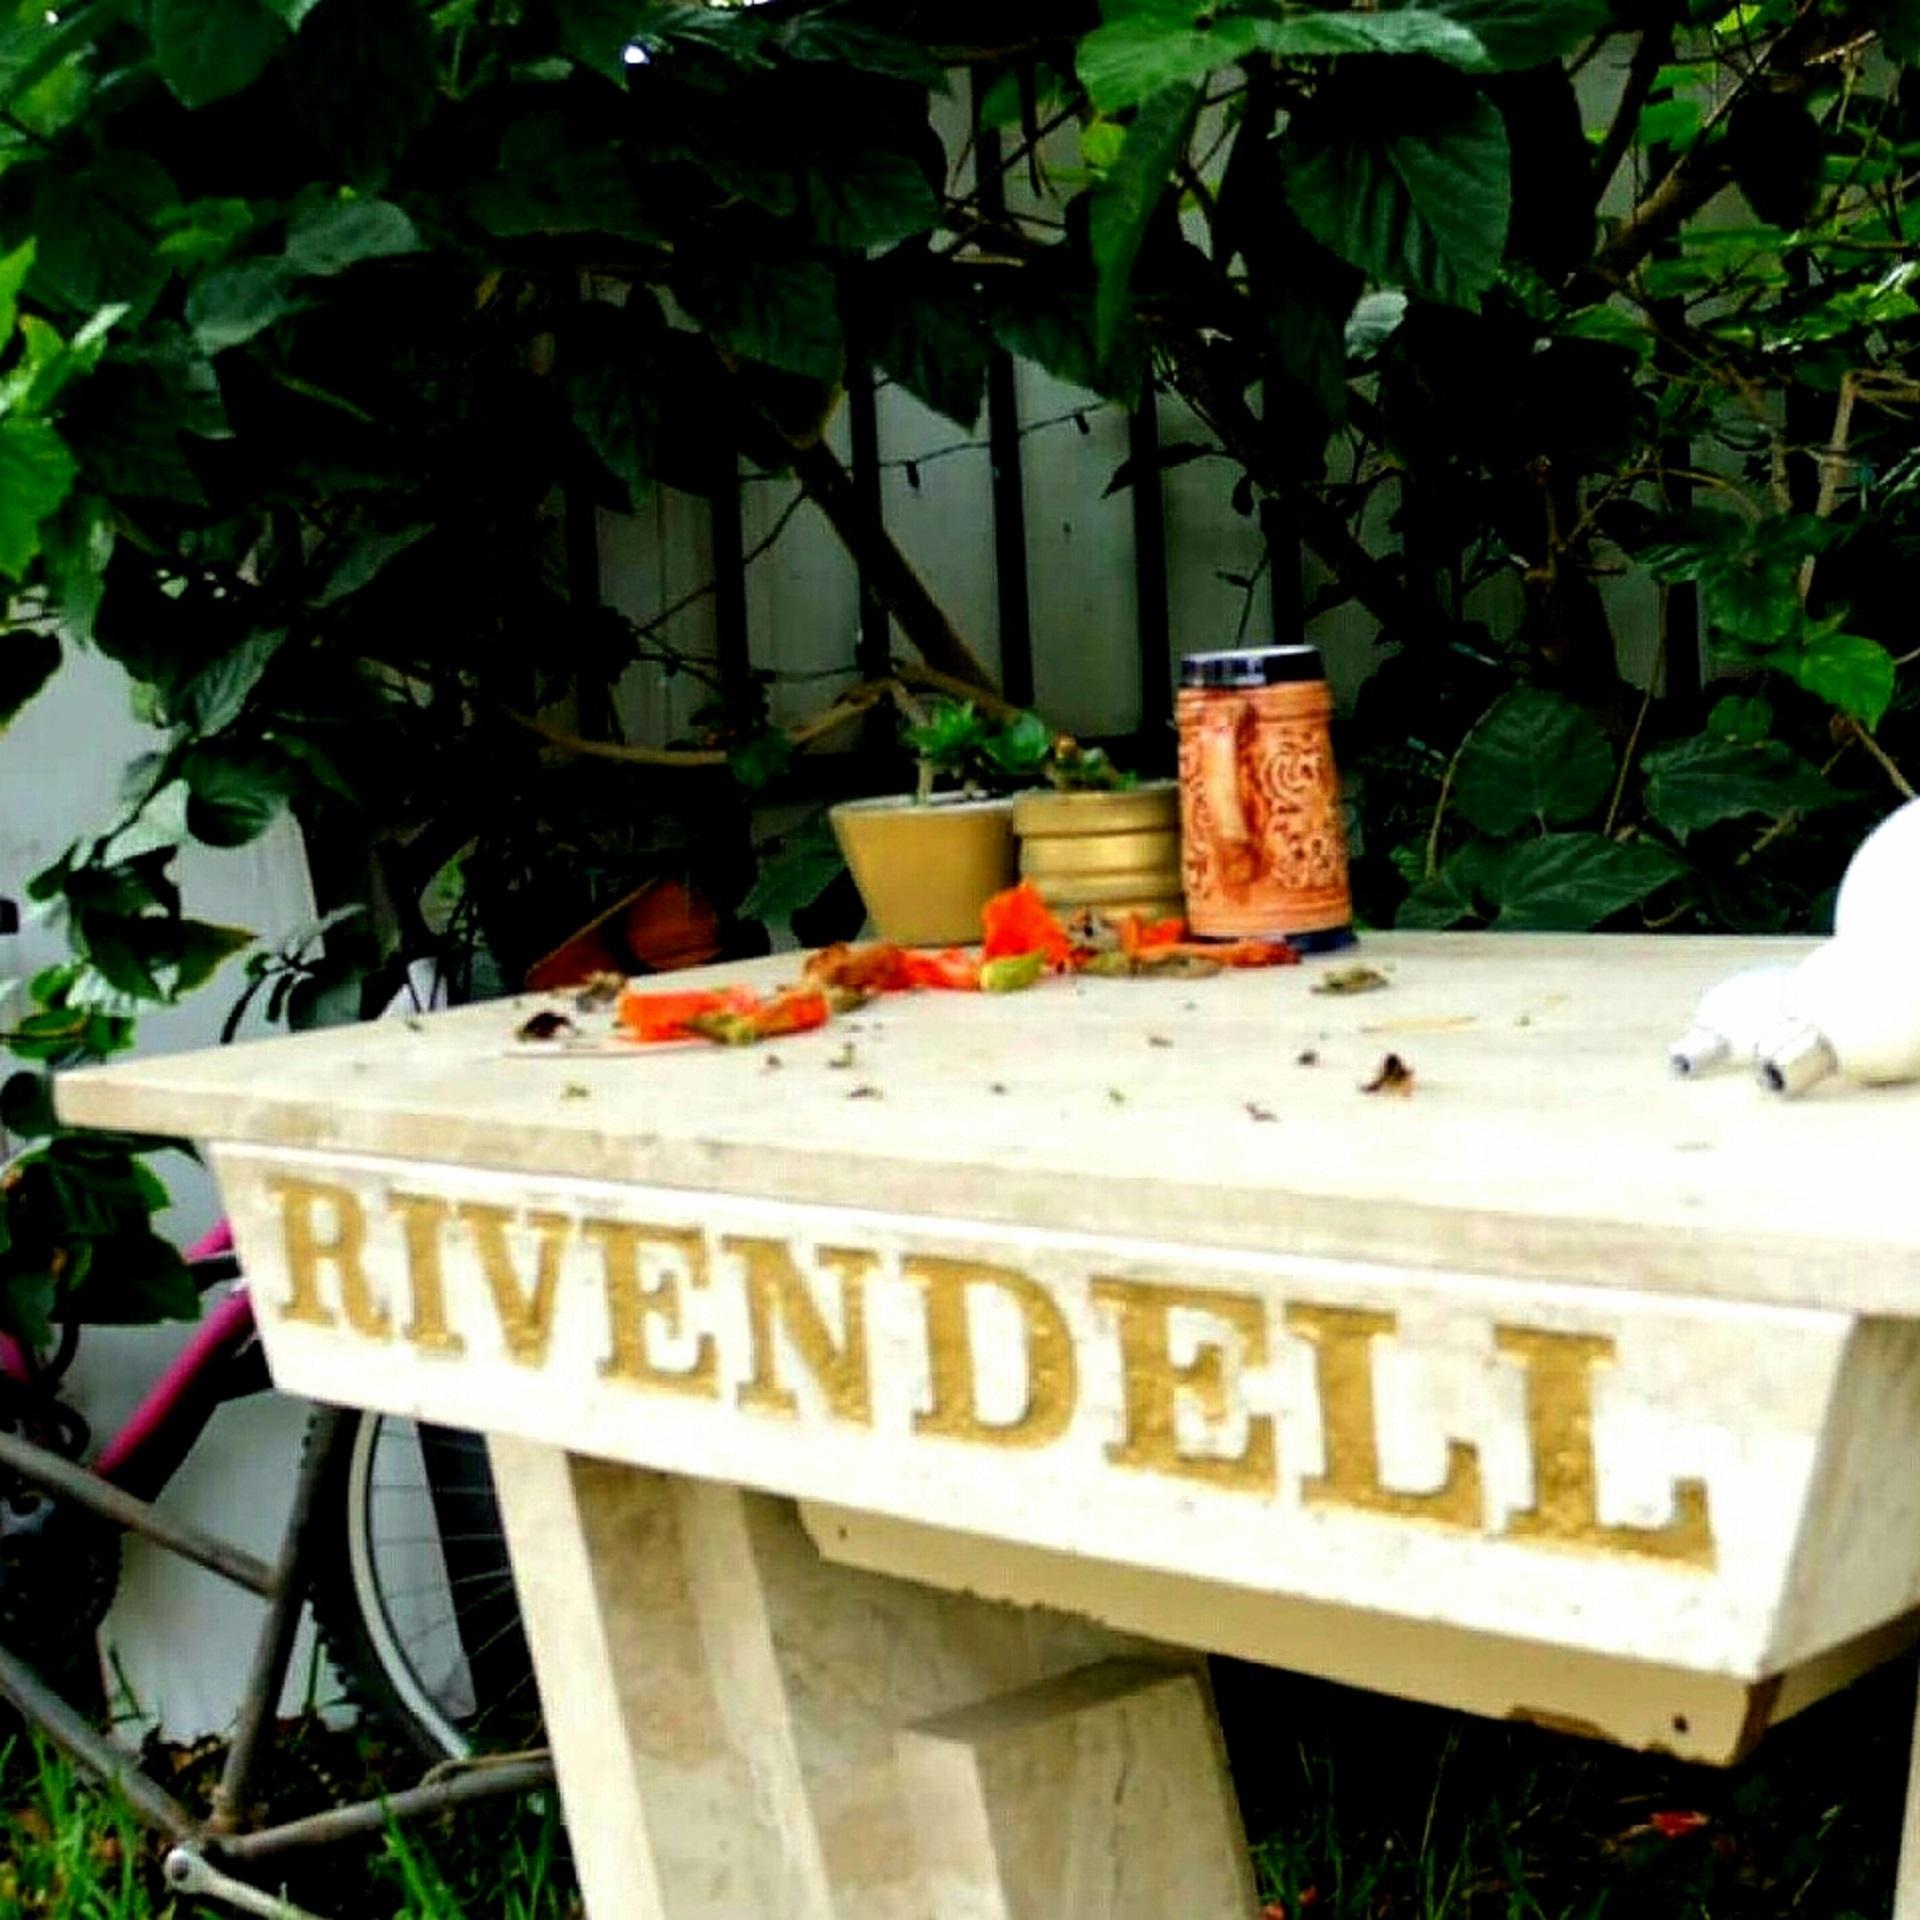 Rivendell Premium